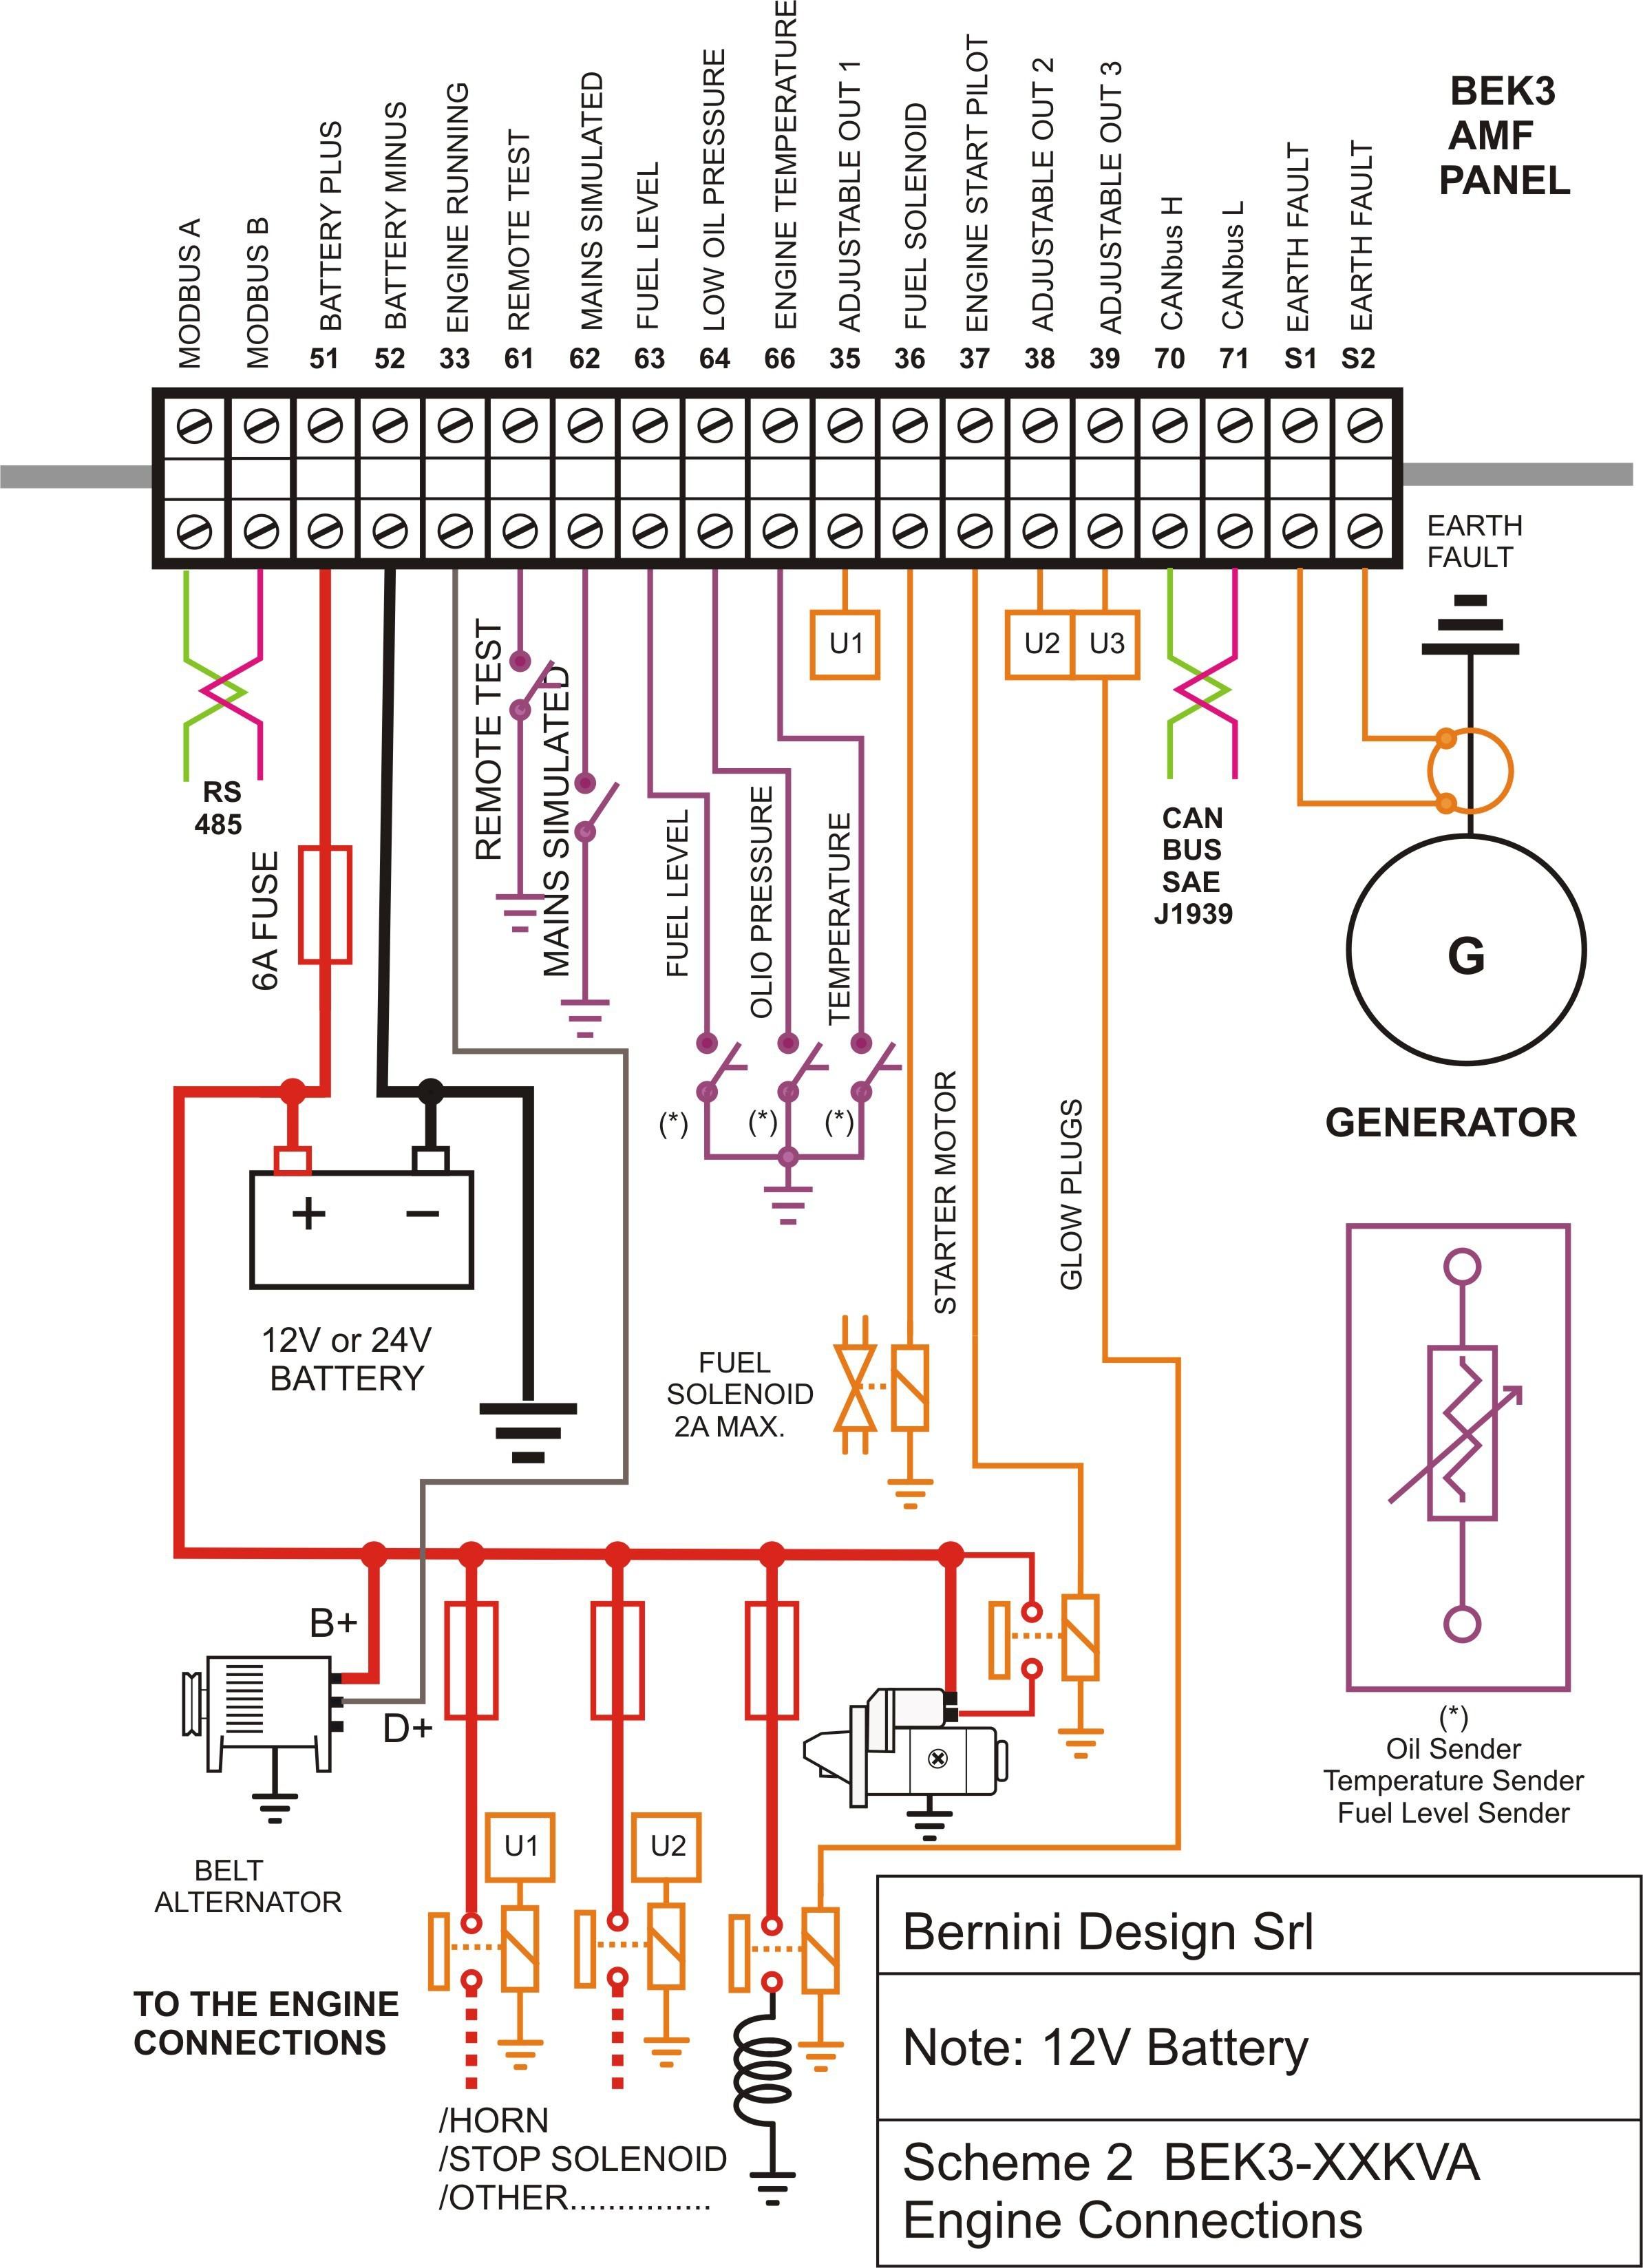 Kohler Engine Diagram | My Wiring DIagram